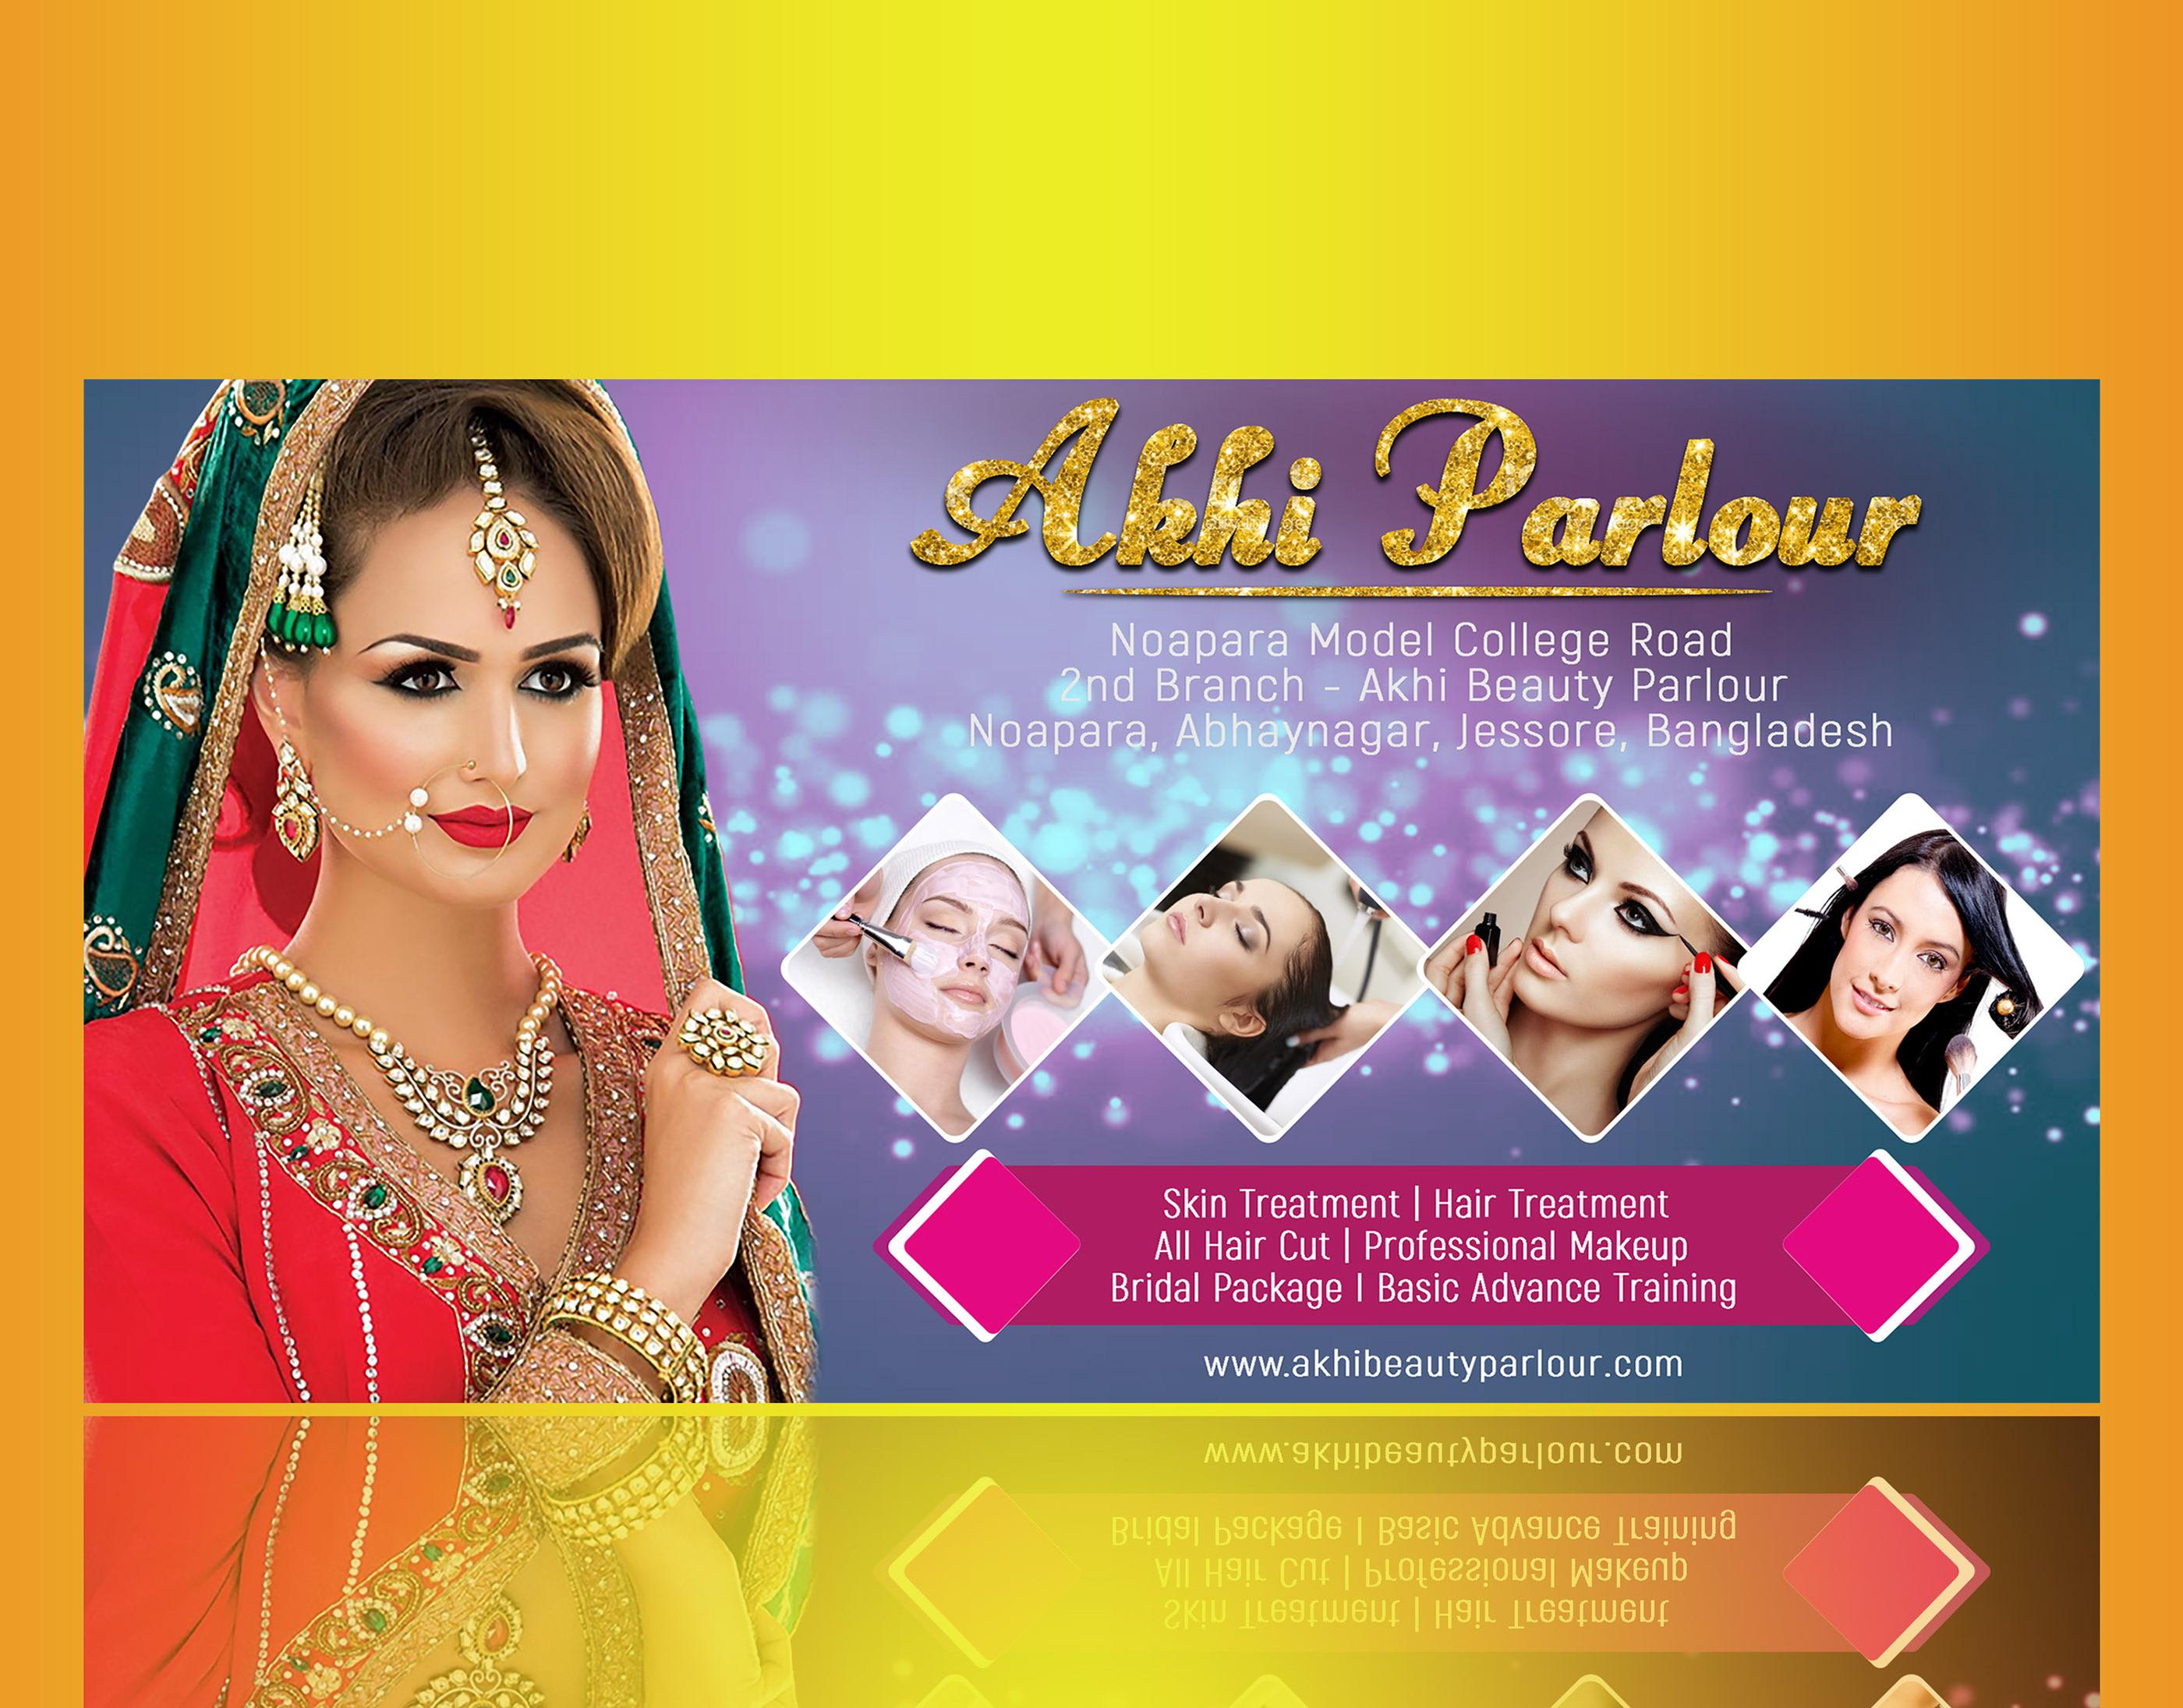 Hair Salon Beauty Parlour Banner Design Psd